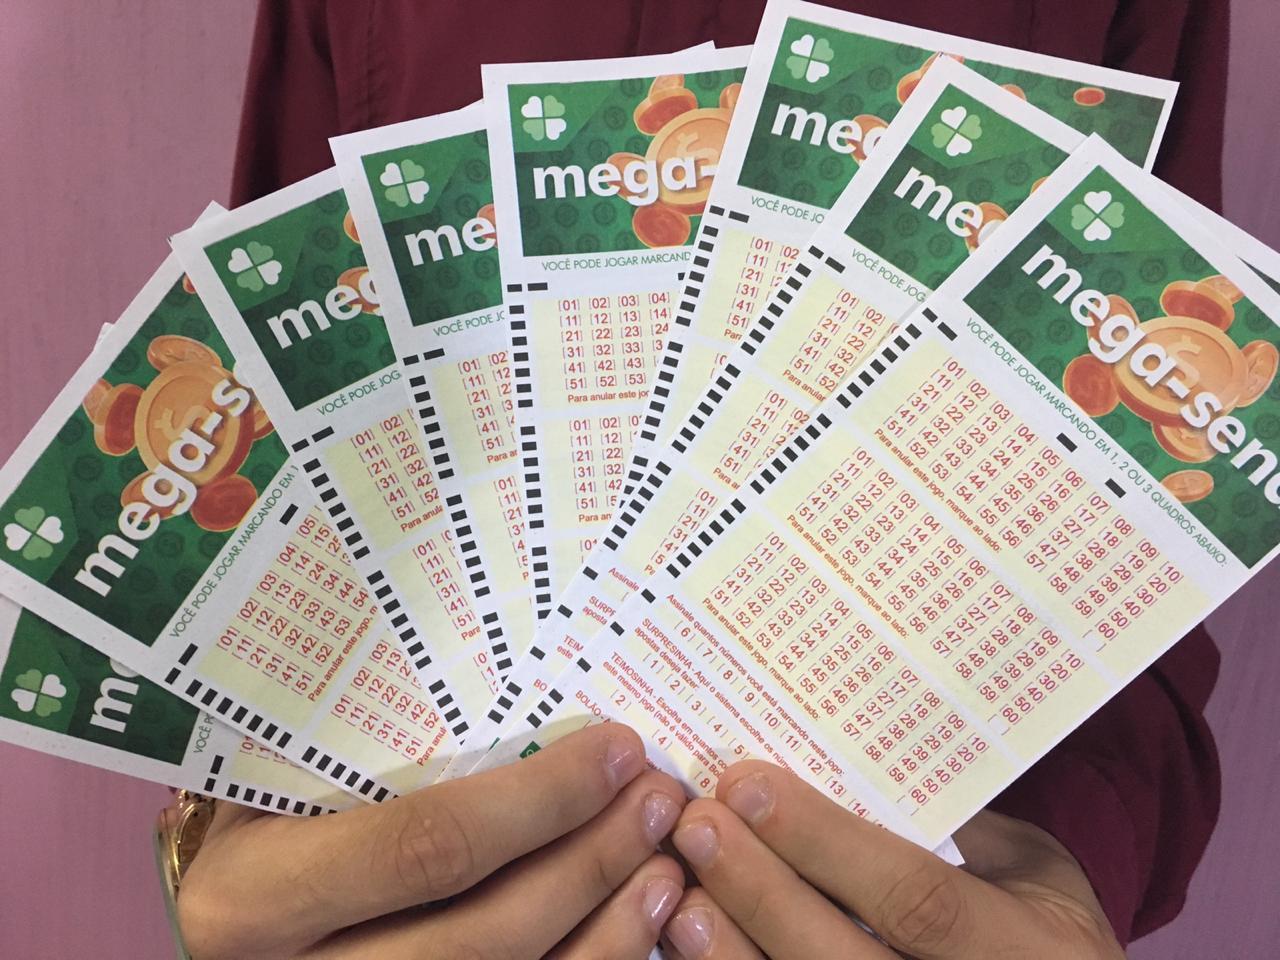 Mega-Saena-5-foto-Claudiana-Silva.jpg